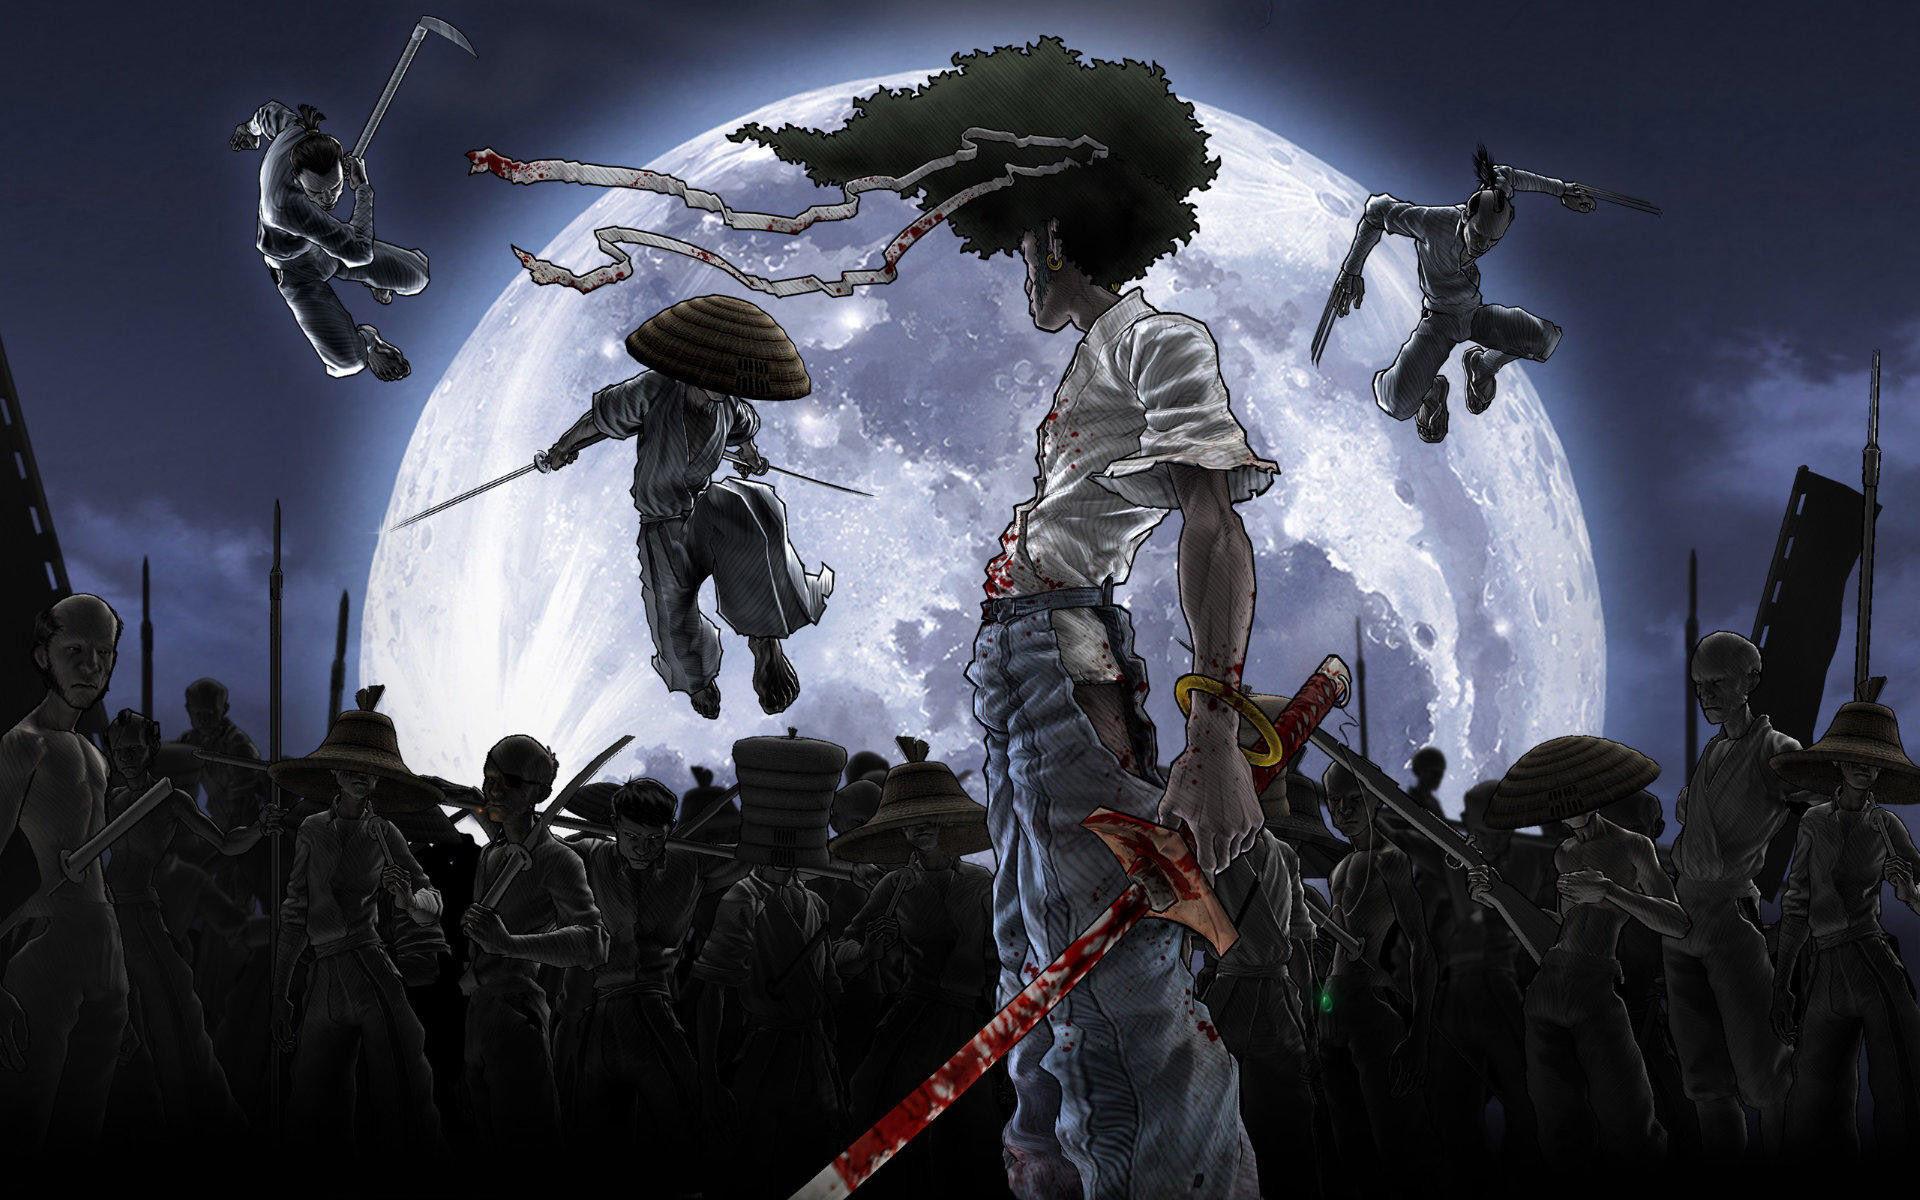 Res: 1920x1200,  Foggy Afro Samurai HD Wallpapers | cartoonwallpapershd.com |  Pinterest | Afro samurai